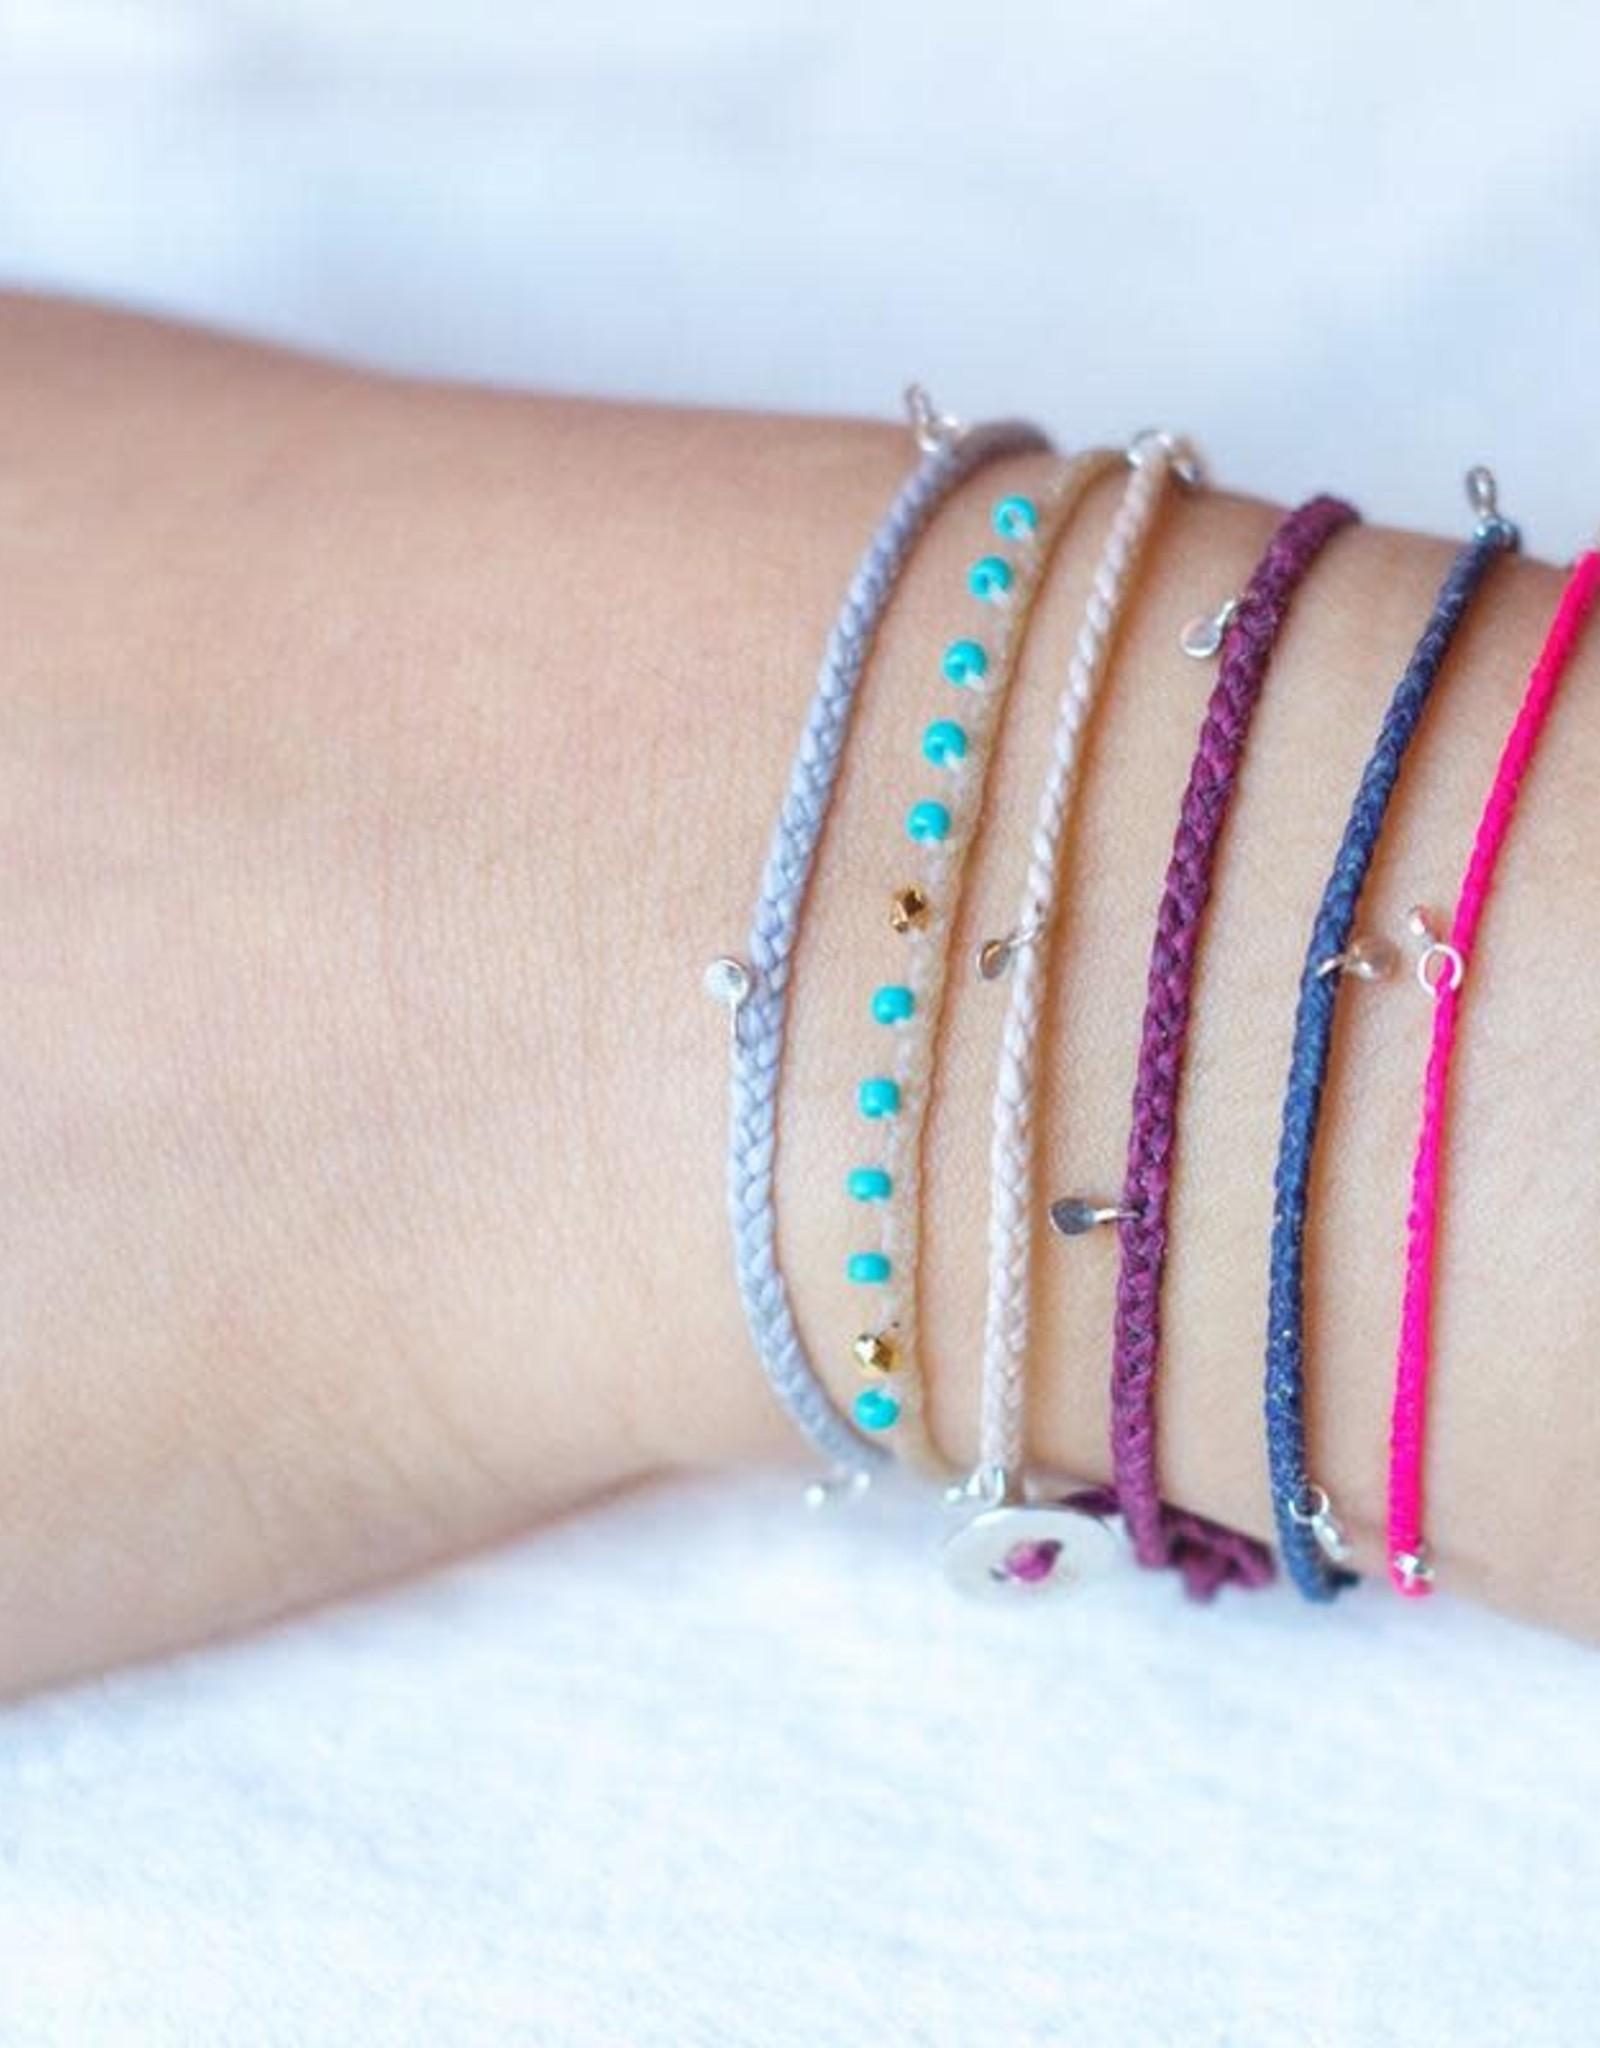 Scosha Fairy Bead Silver Bracelet - Lavender